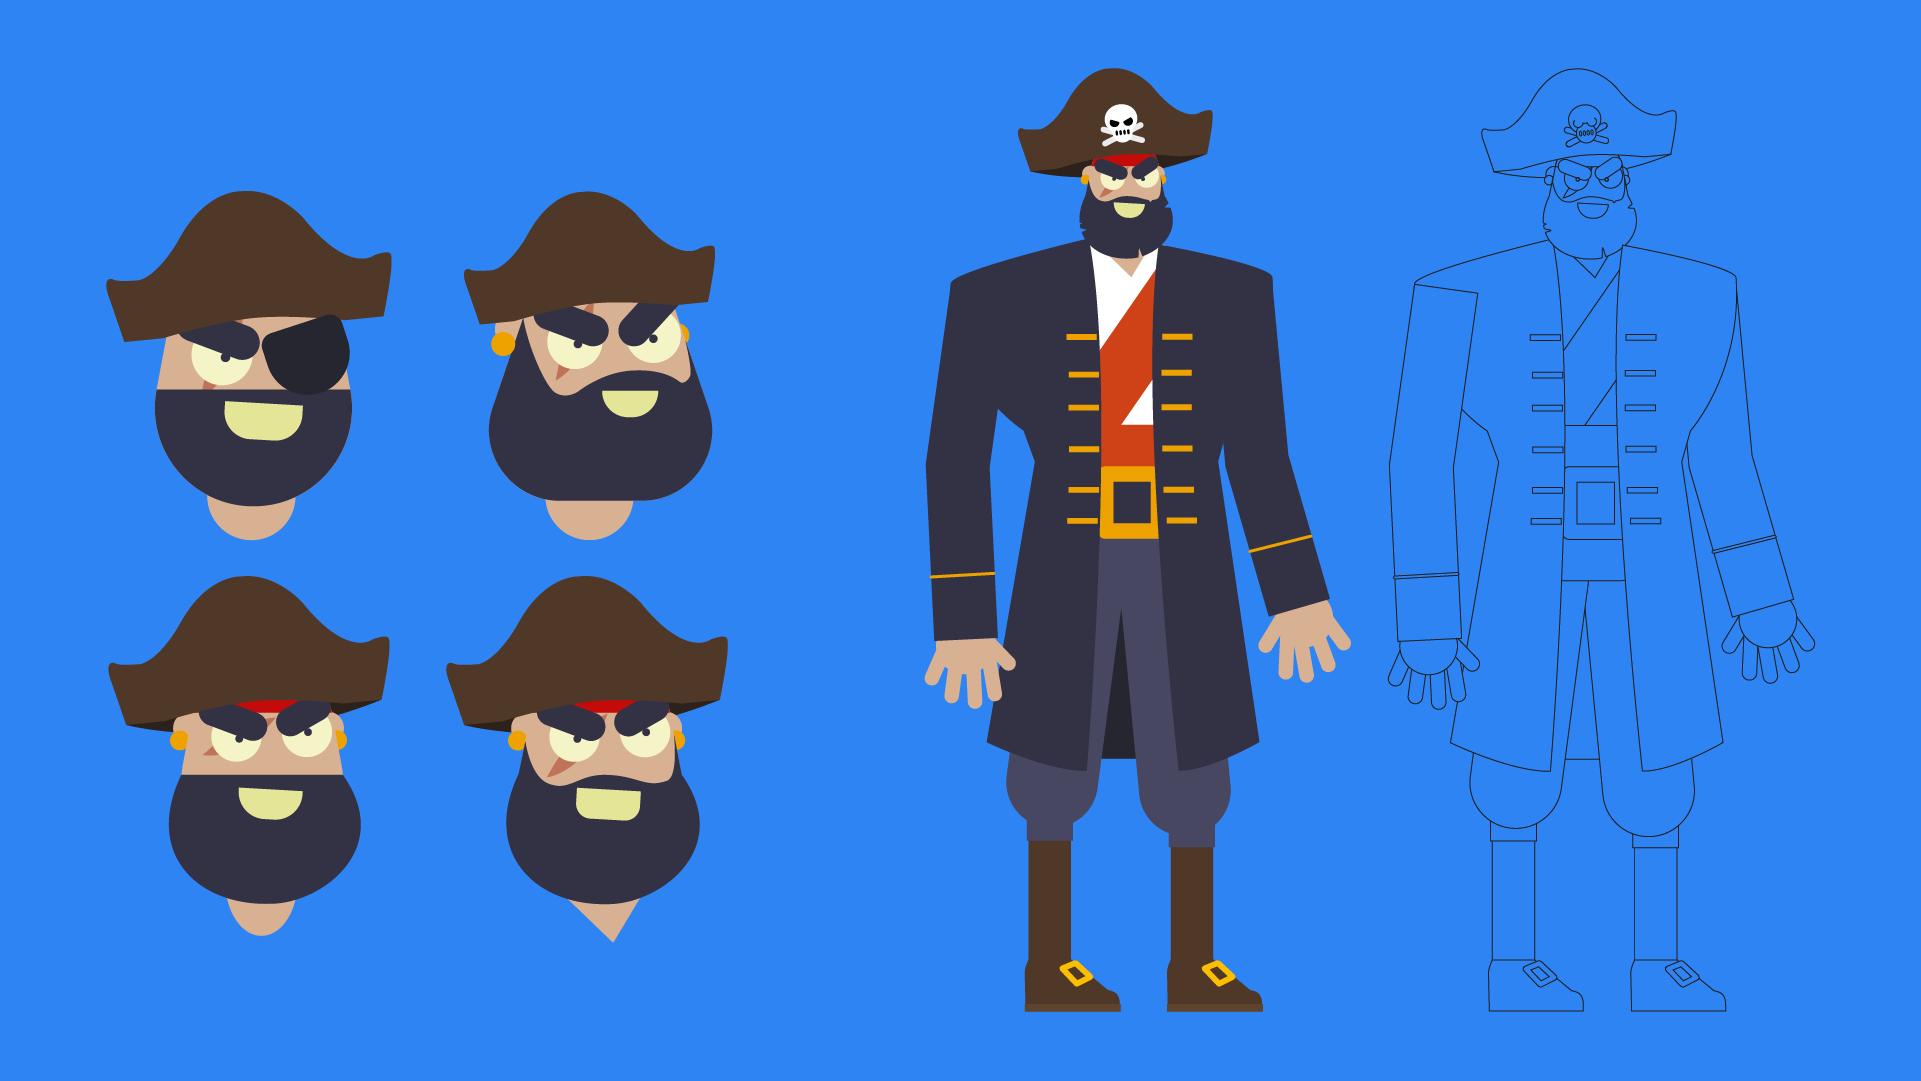 character_design-01